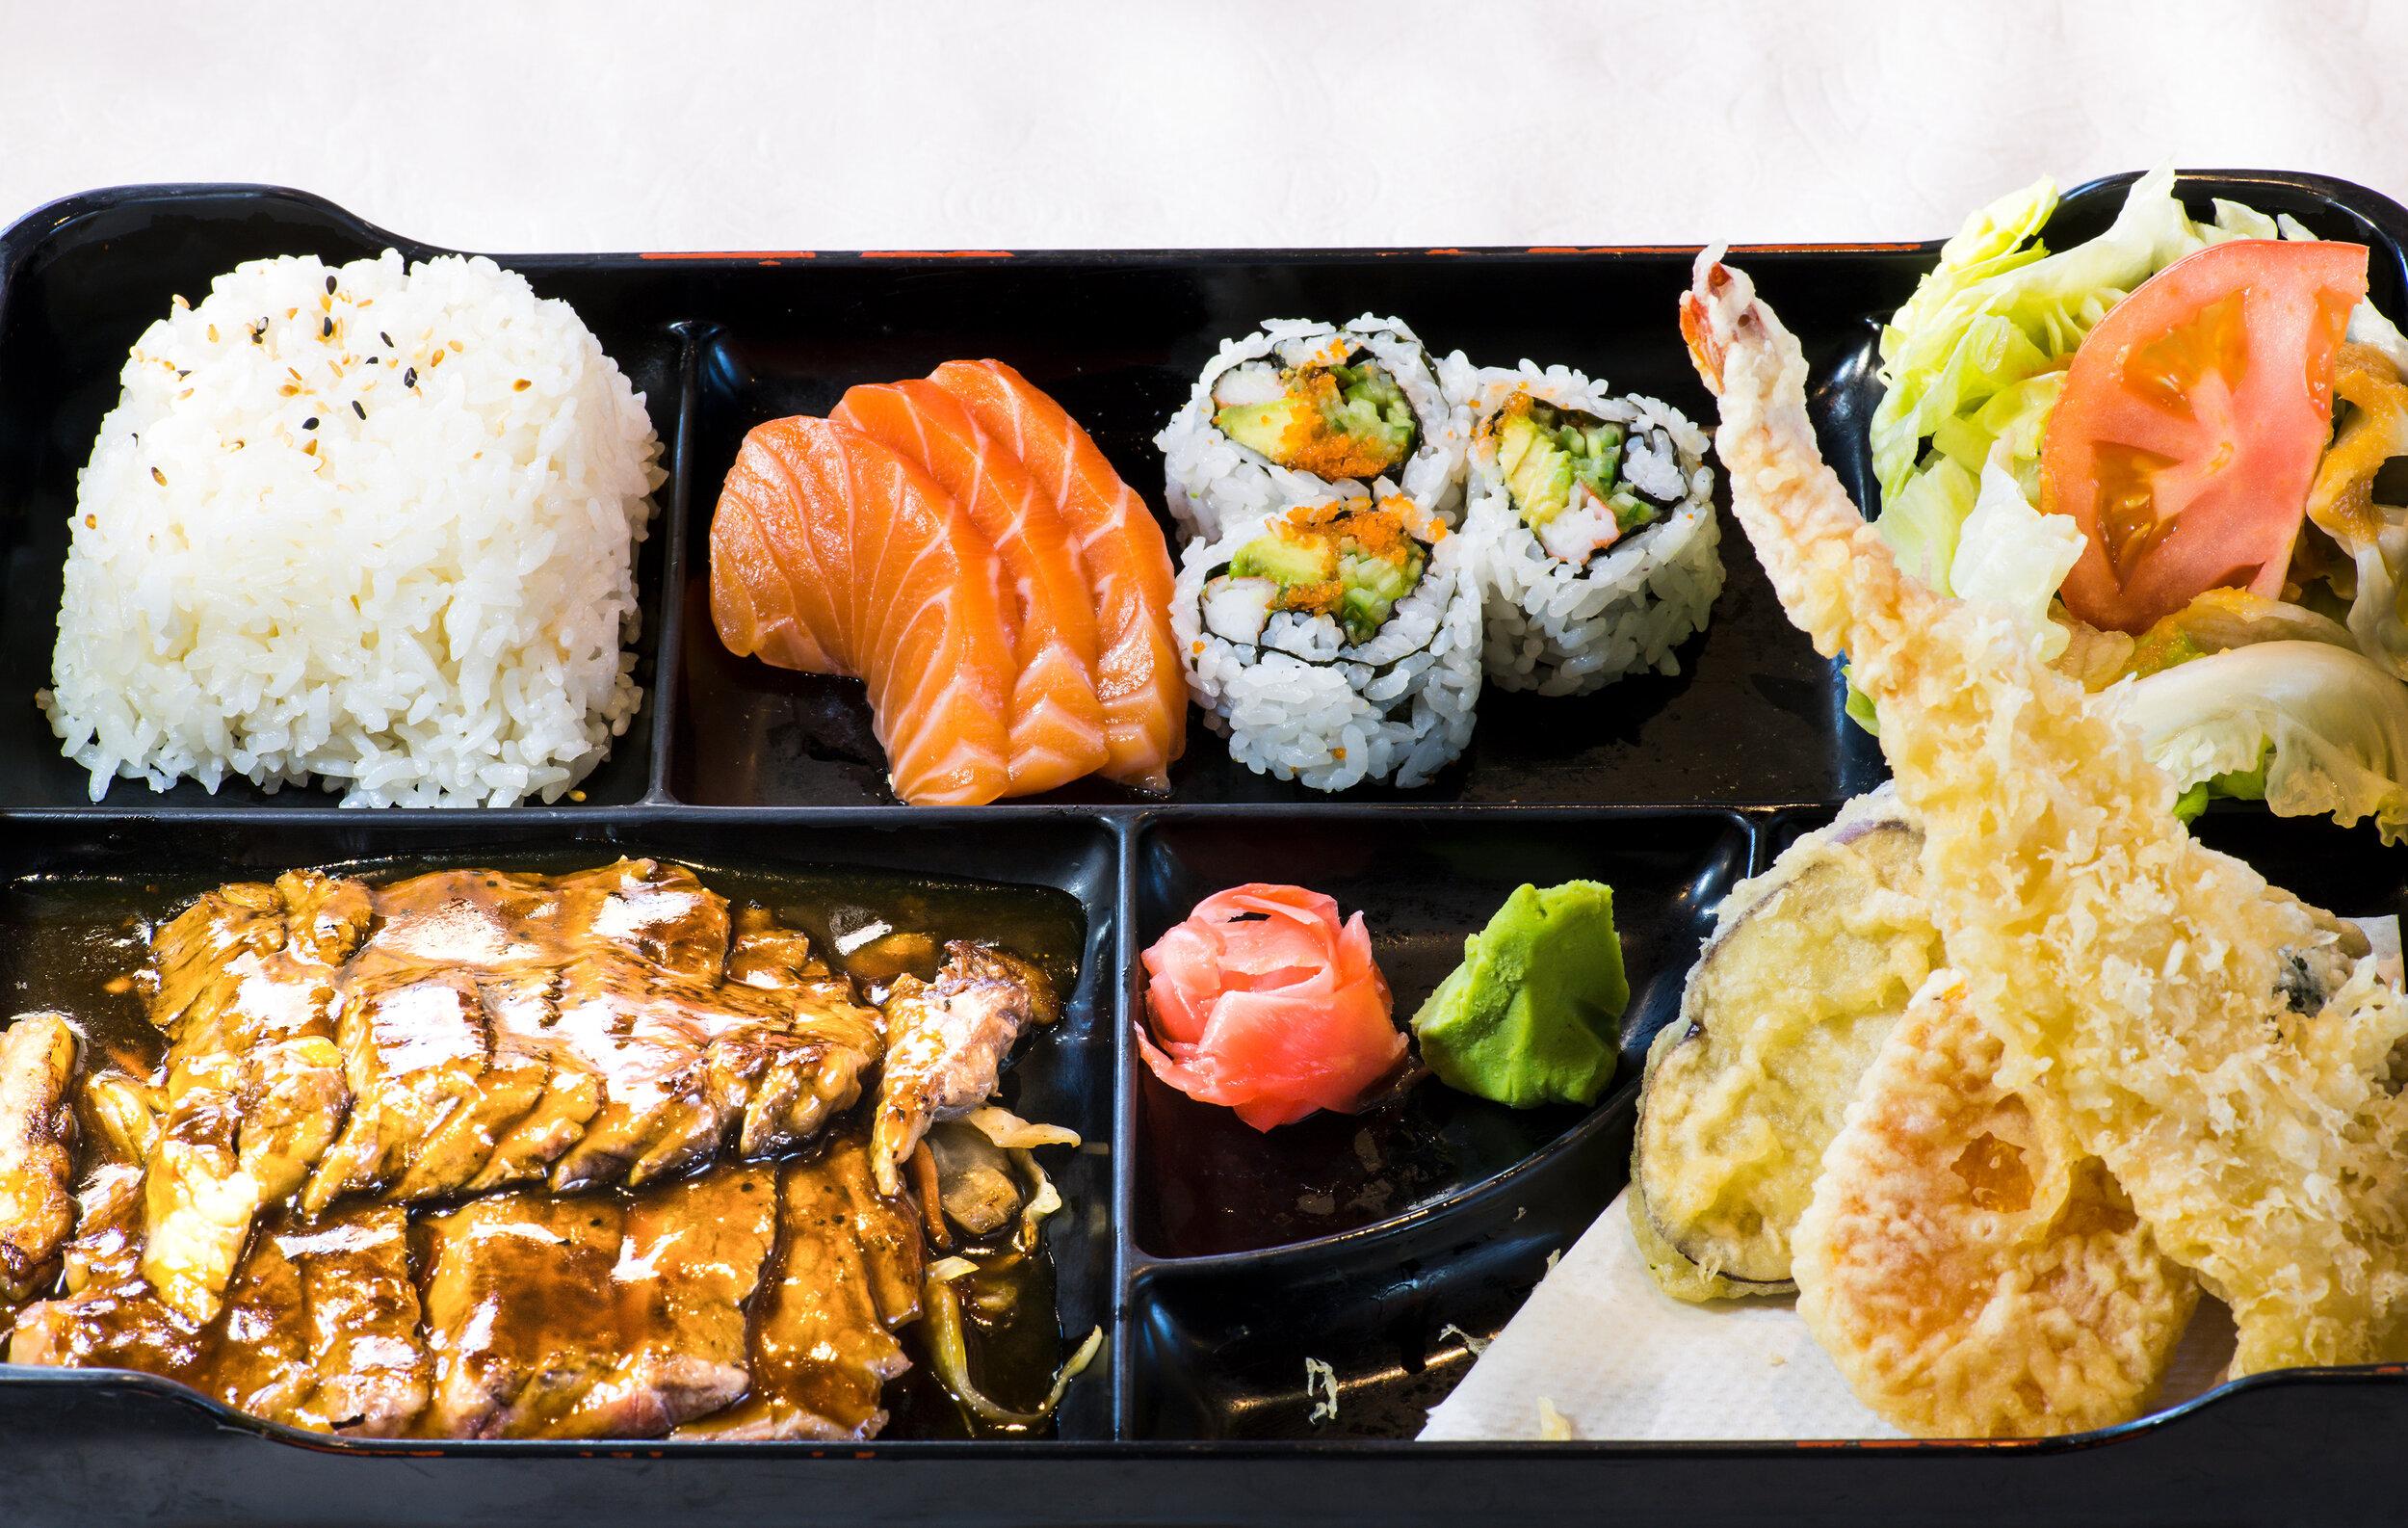 Beef Teriyaki Bento Box $19.99